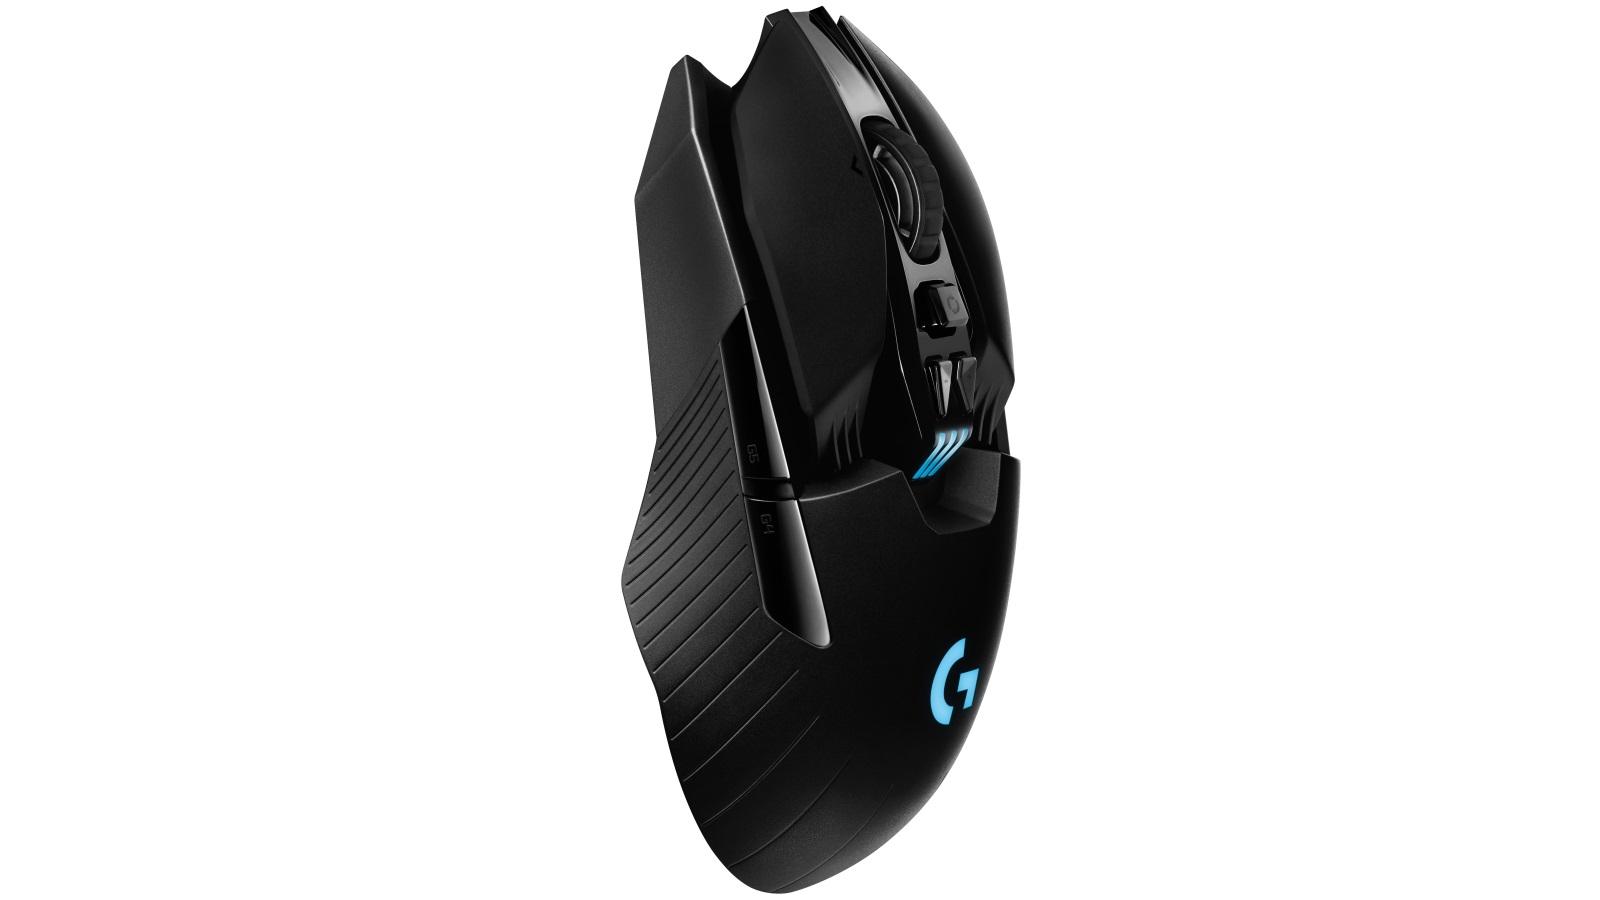 Buy Logitech G903 Lightspeed Wireless Gaming Mouse | Harvey Norman AU